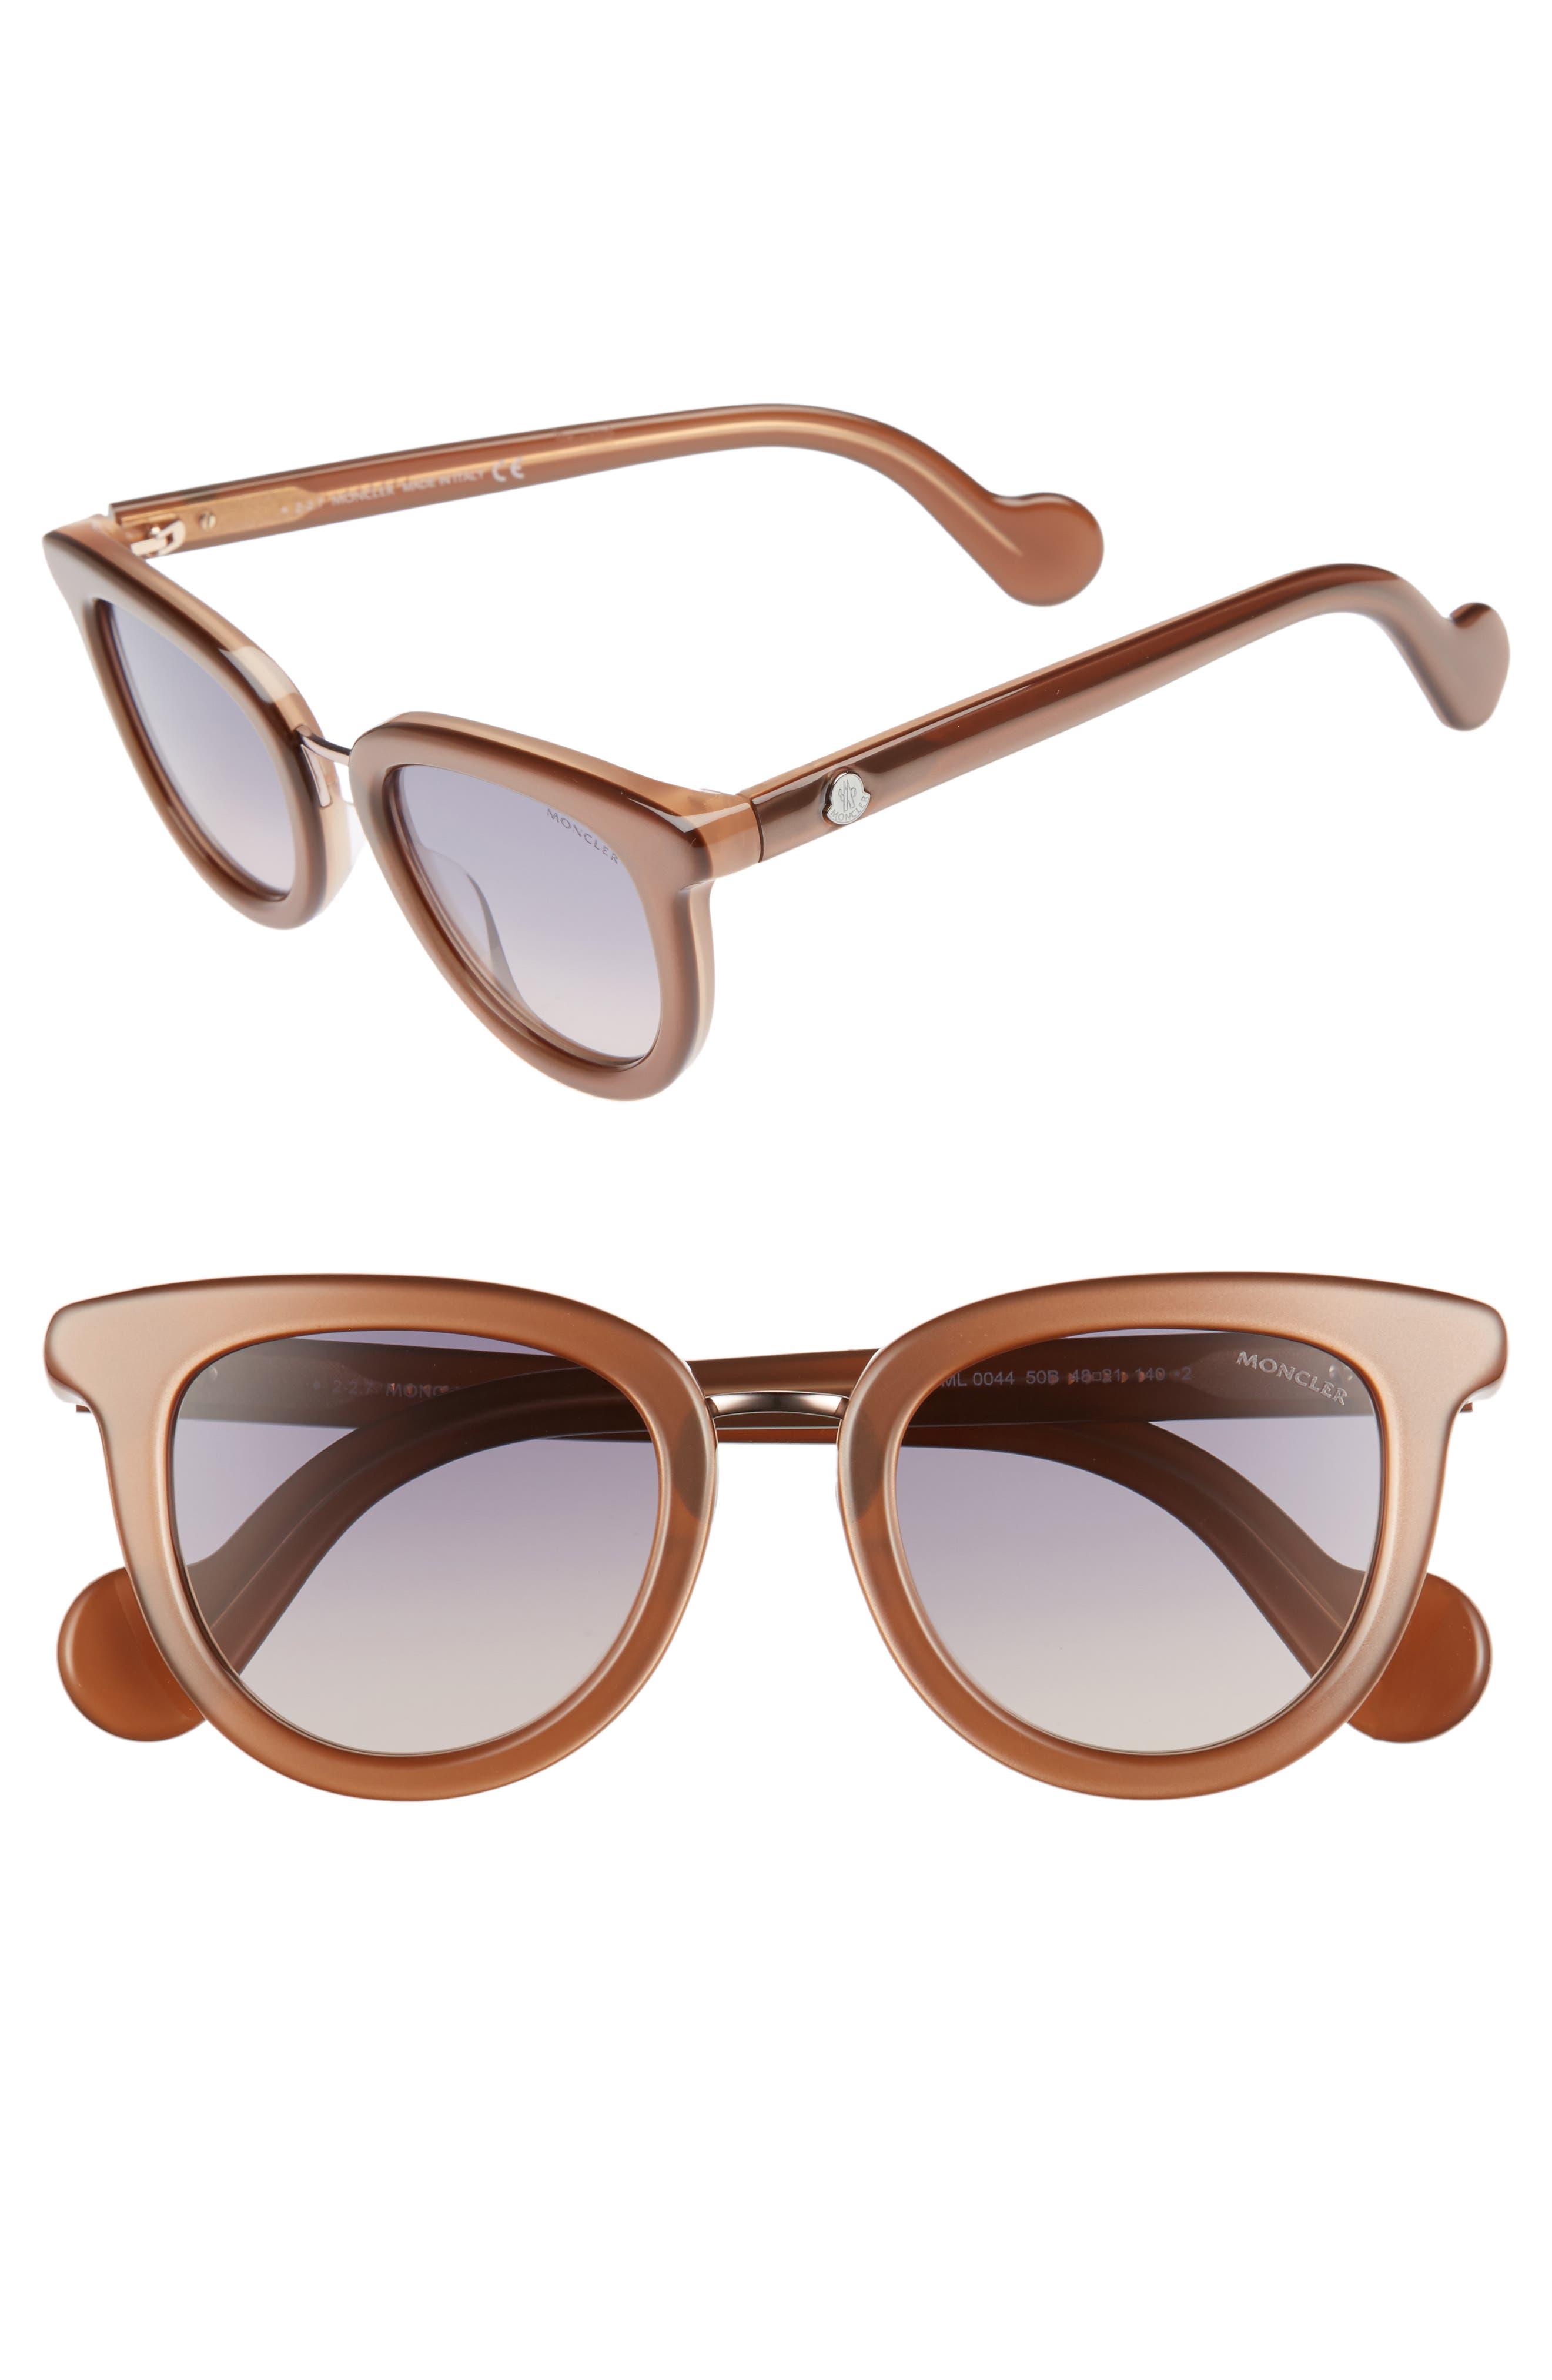 48mm Cat Eye Sunglasses,                             Main thumbnail 1, color,                             PEARL BROWN/ GREY/ SAND